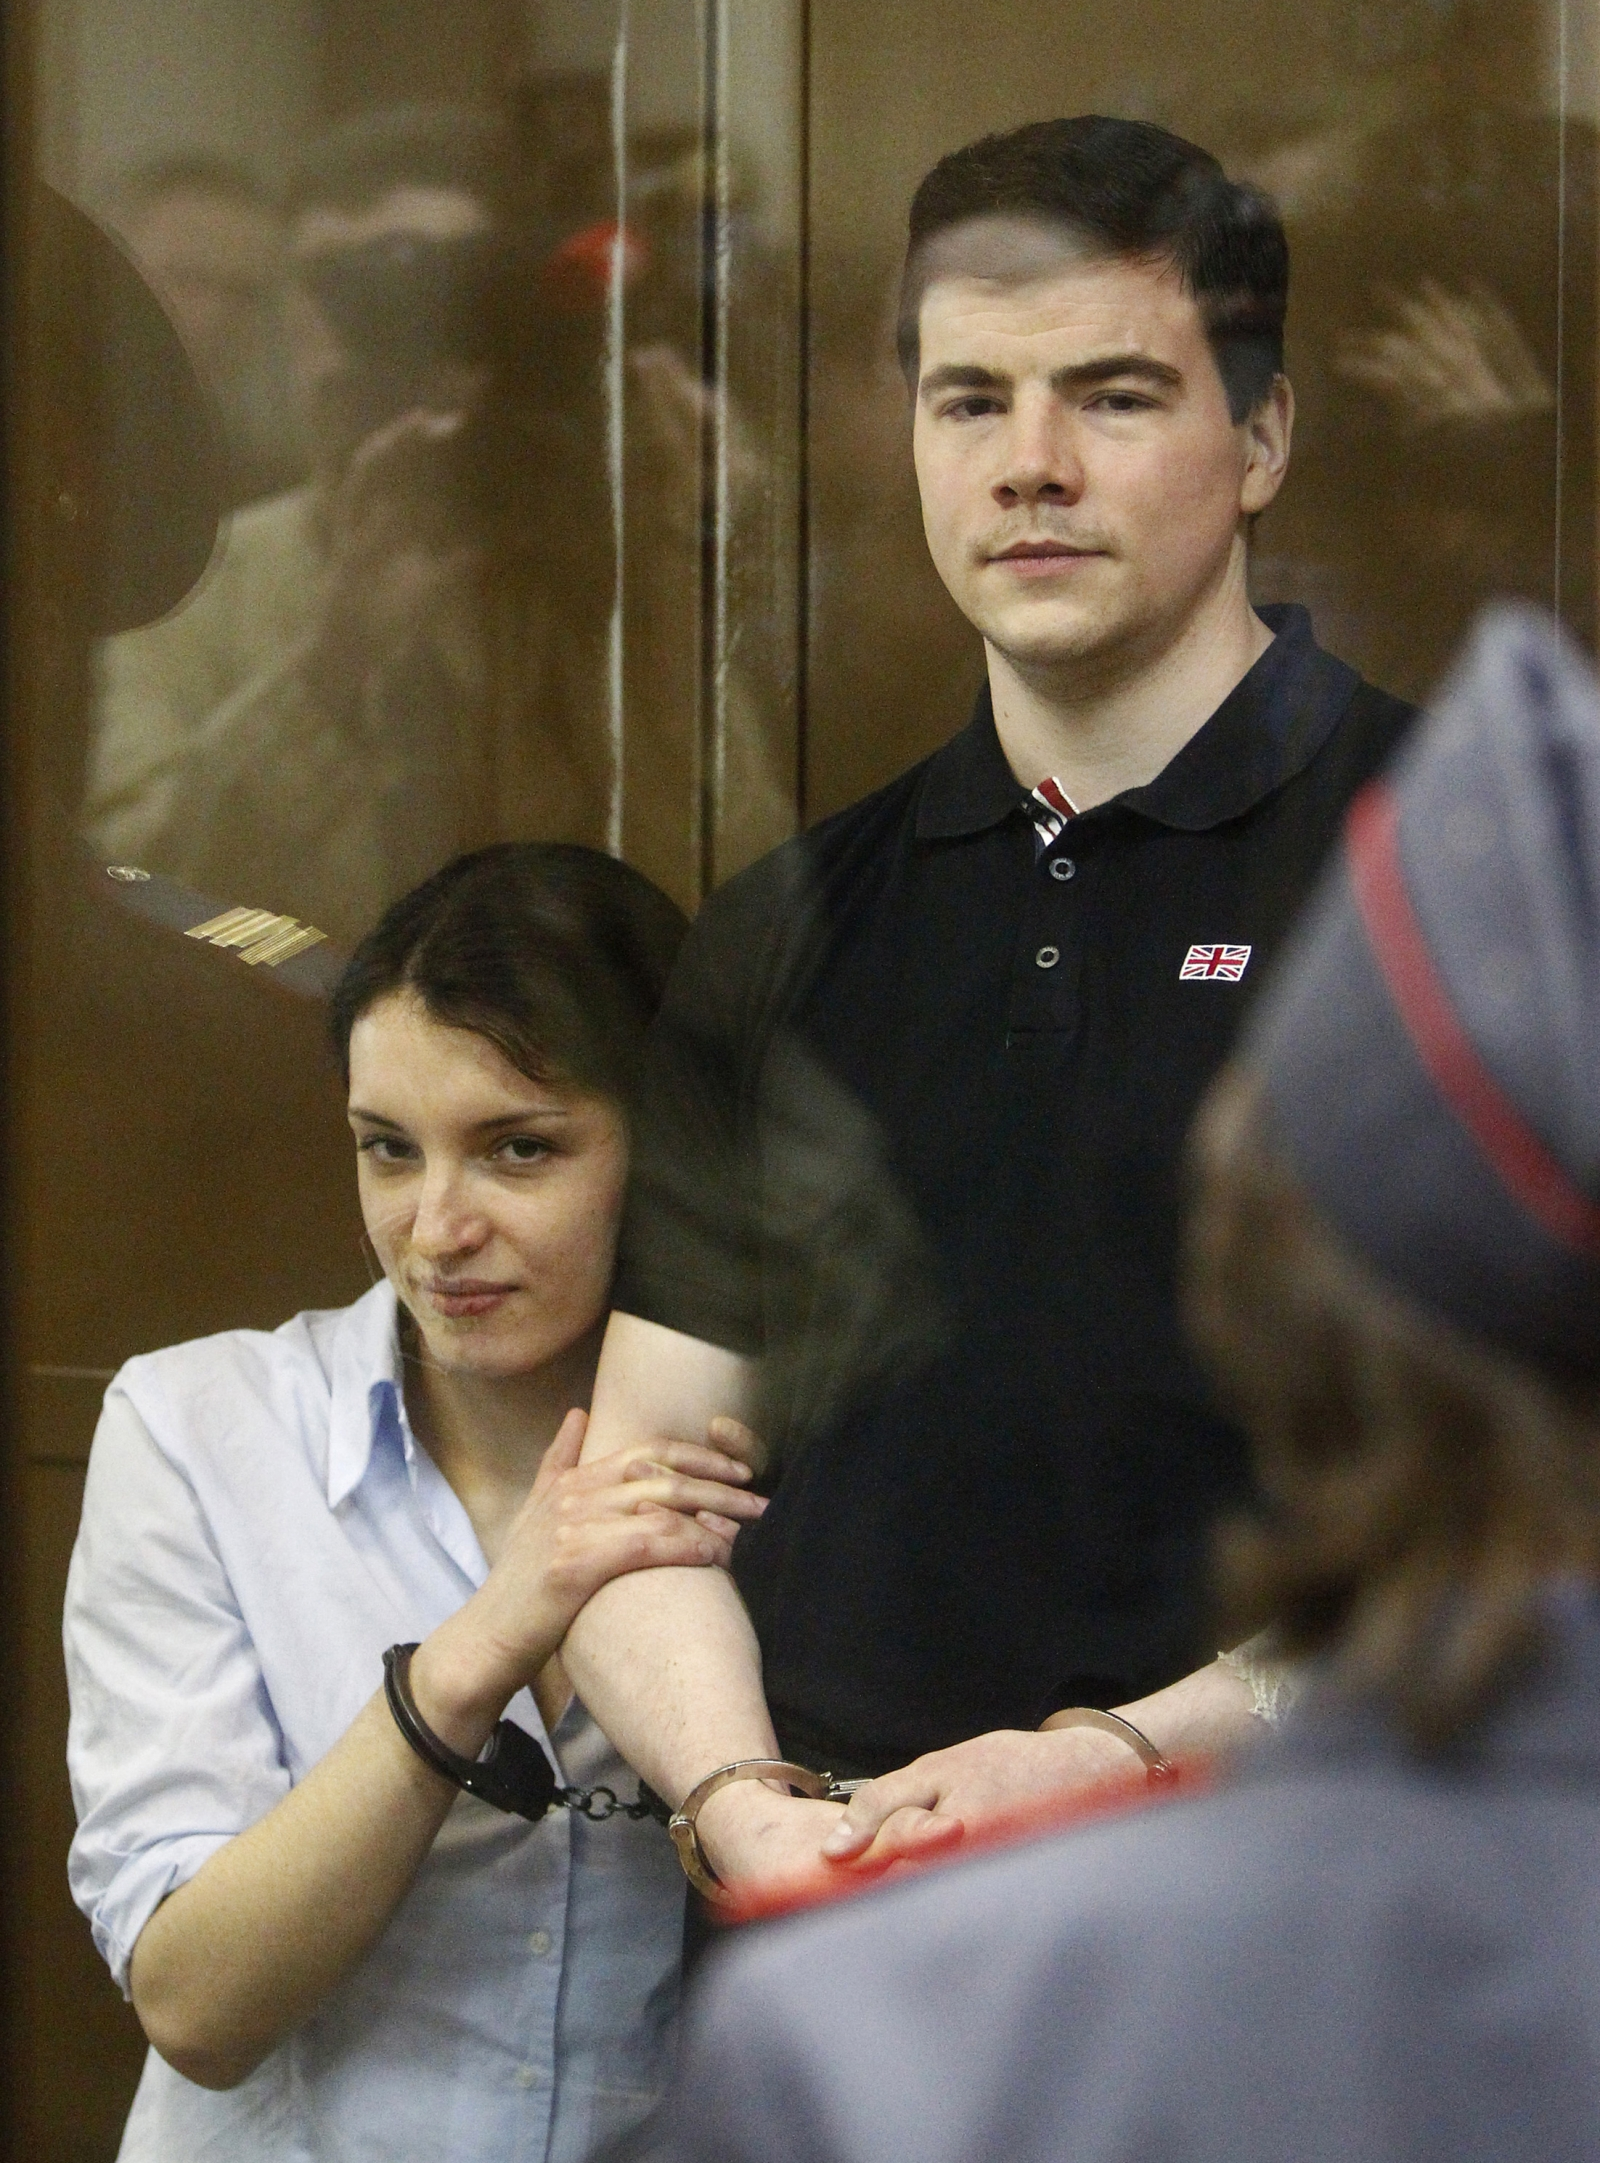 Khasis and Tikhonov